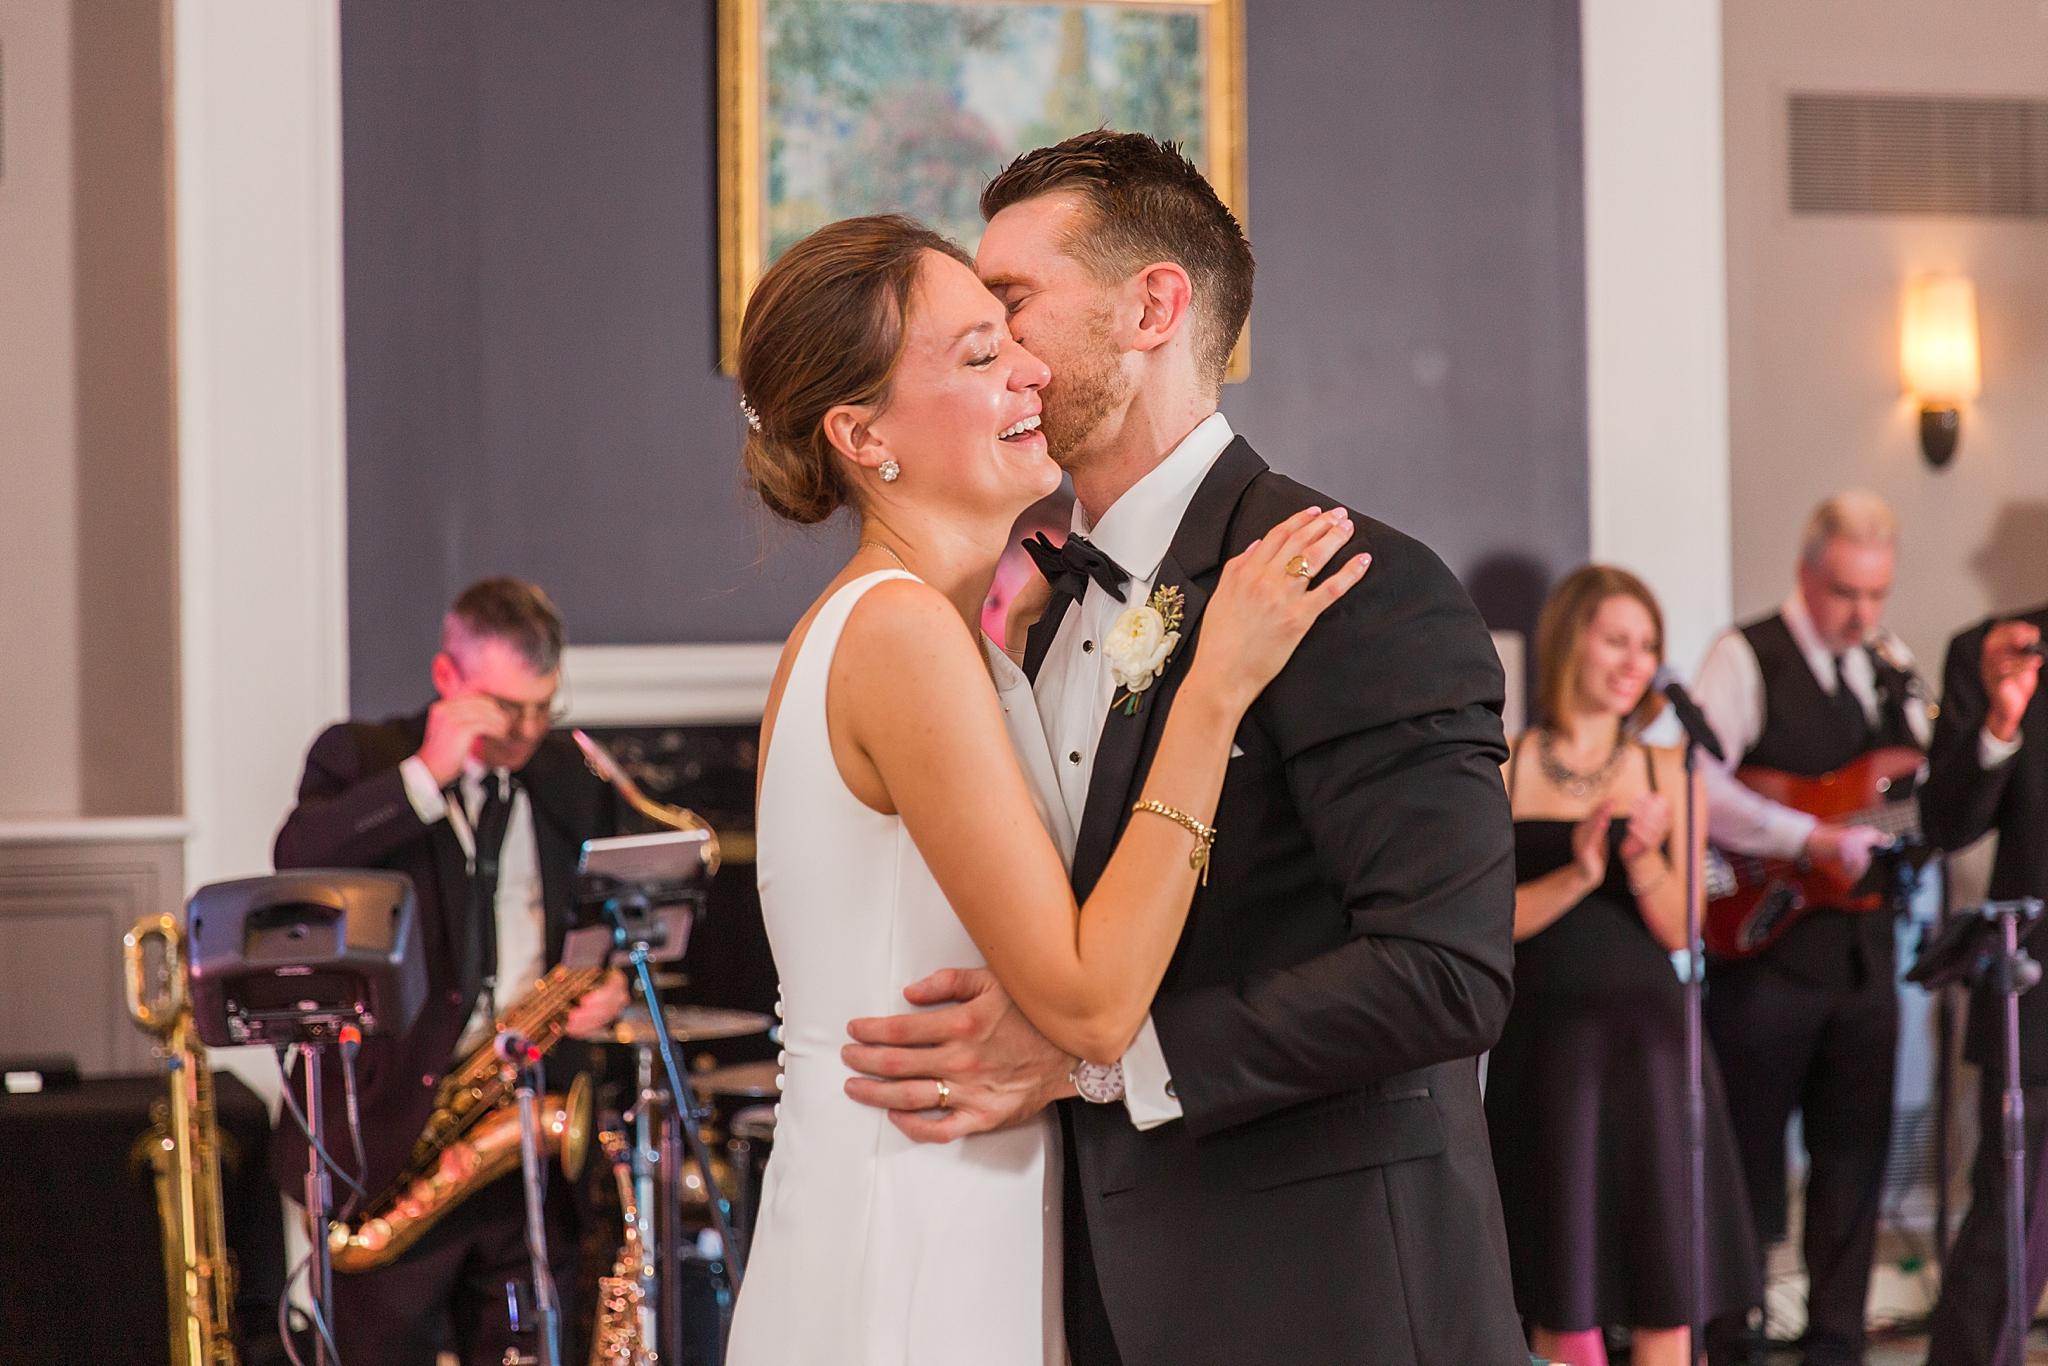 detroit-wedding-photographer-grosse-pointe-academy-chapel-detroit-golf-club-wedding-carly-matt-by-courtney-carolyn-photography_0092.jpg